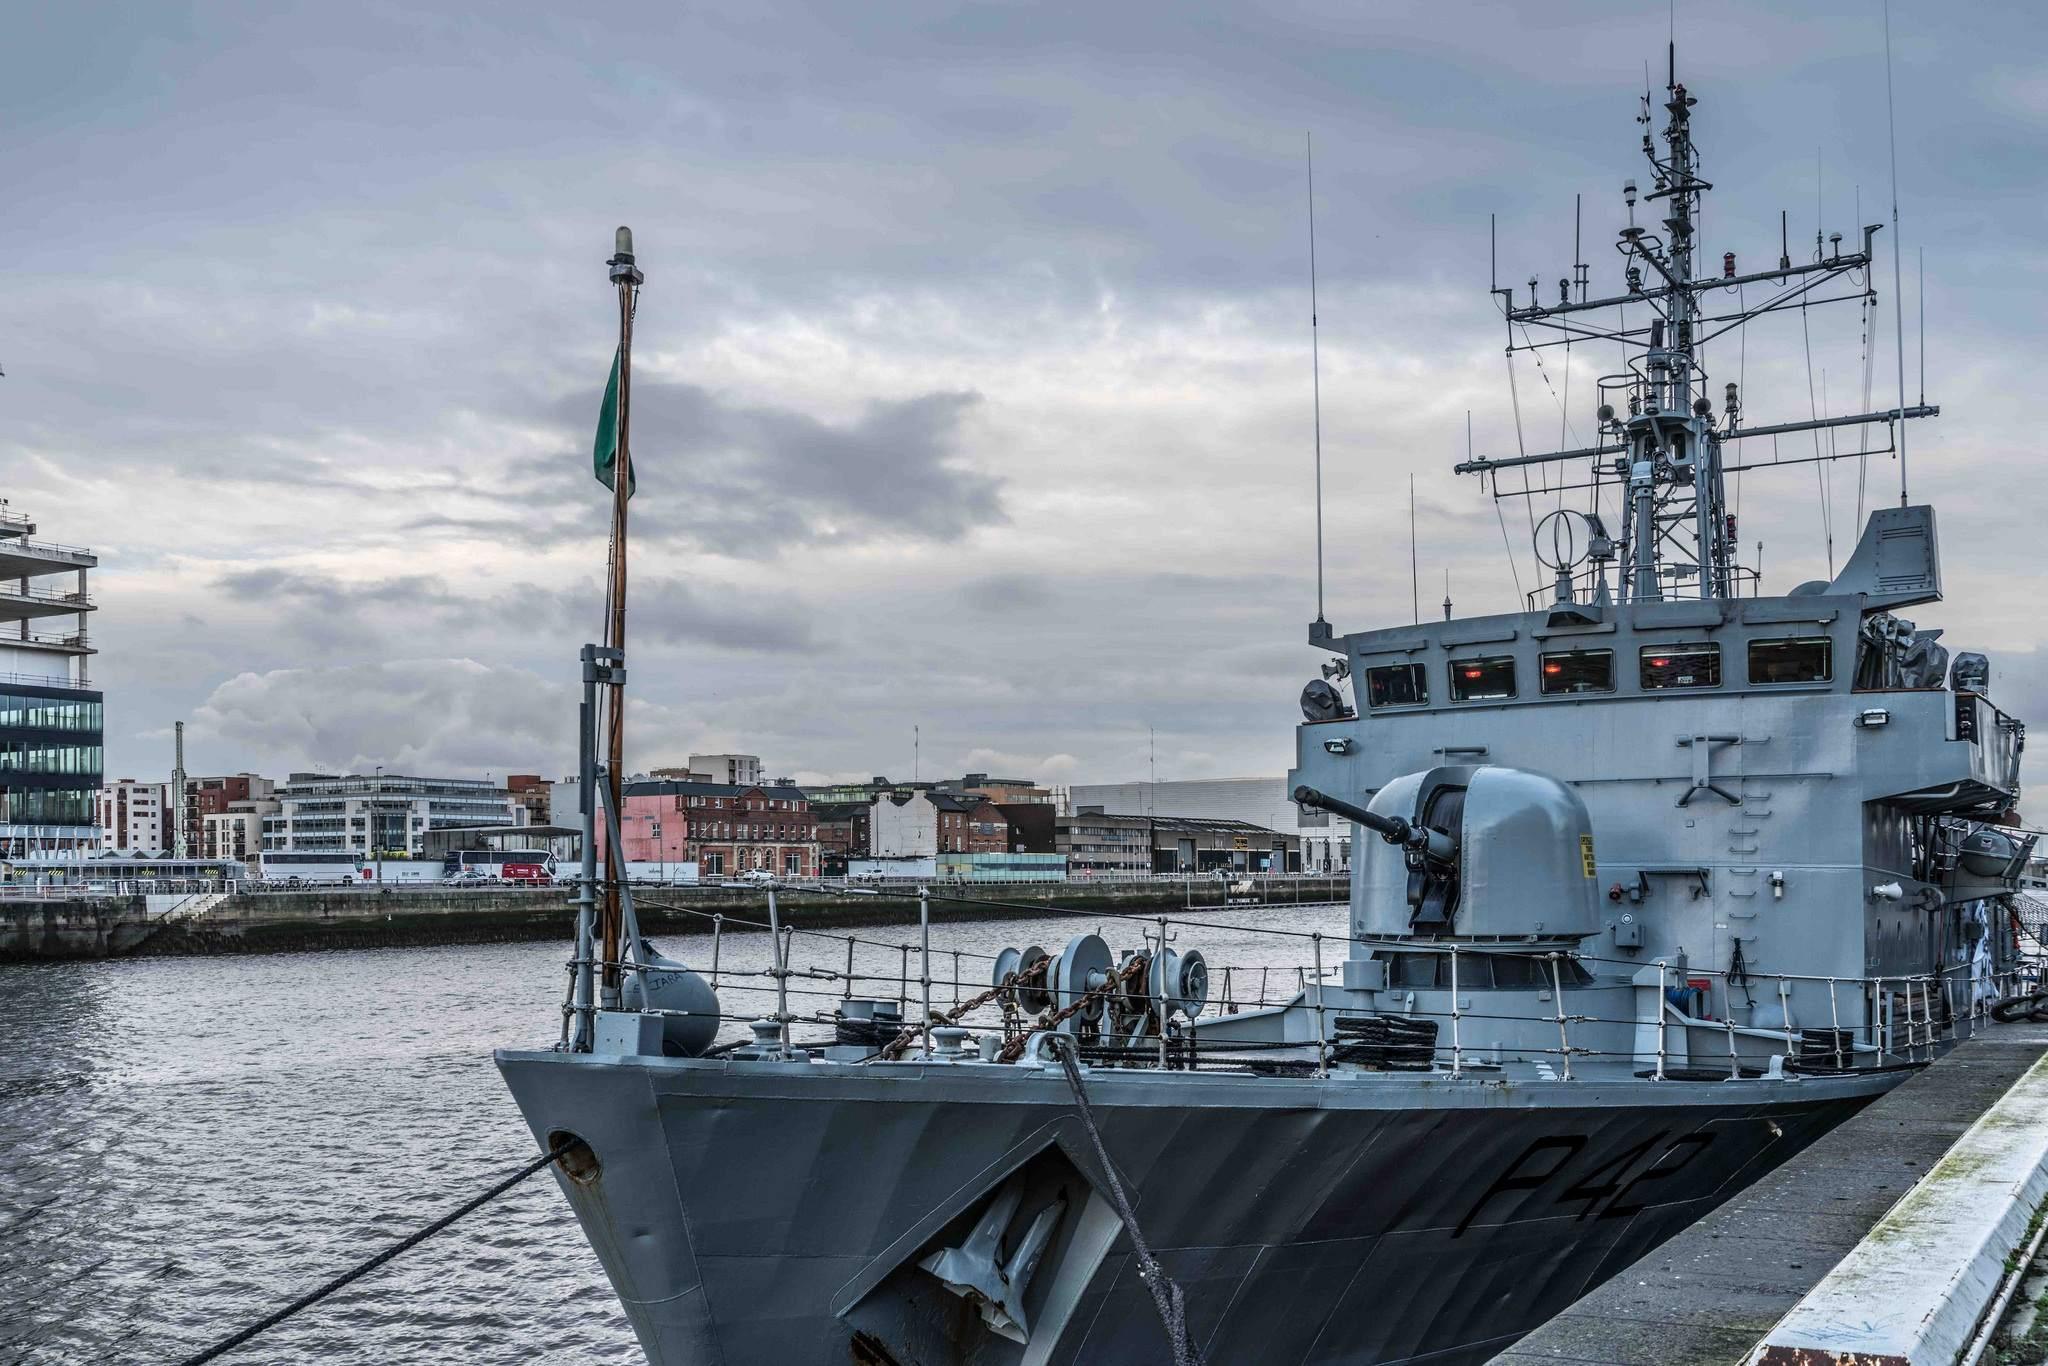 dublin docklands9 Walking Around Dublin Docklands by Marphy